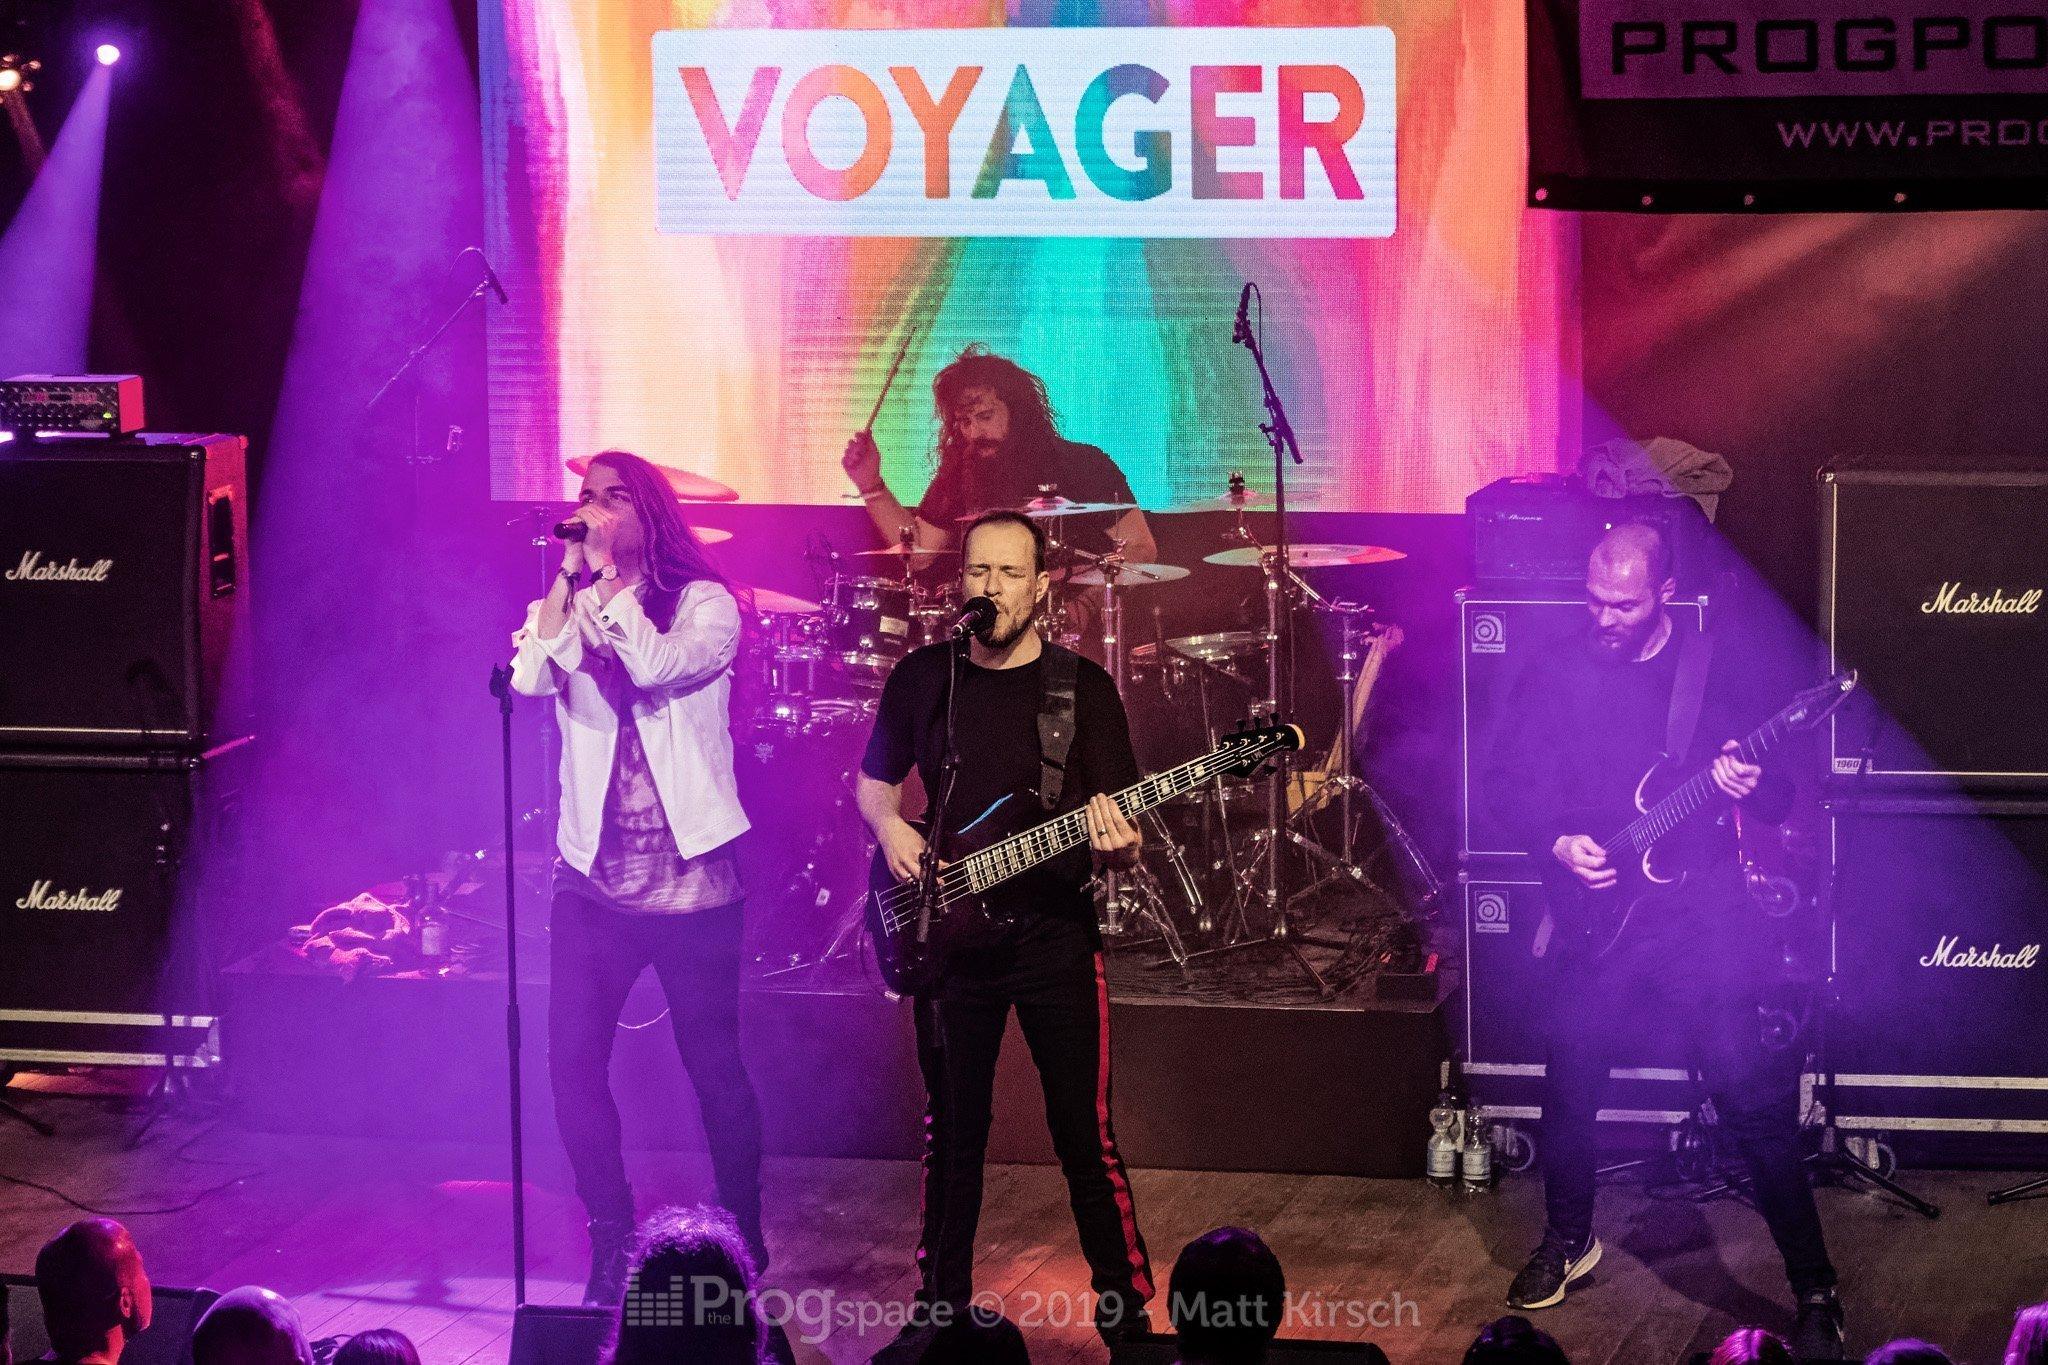 20191004-voyager-045